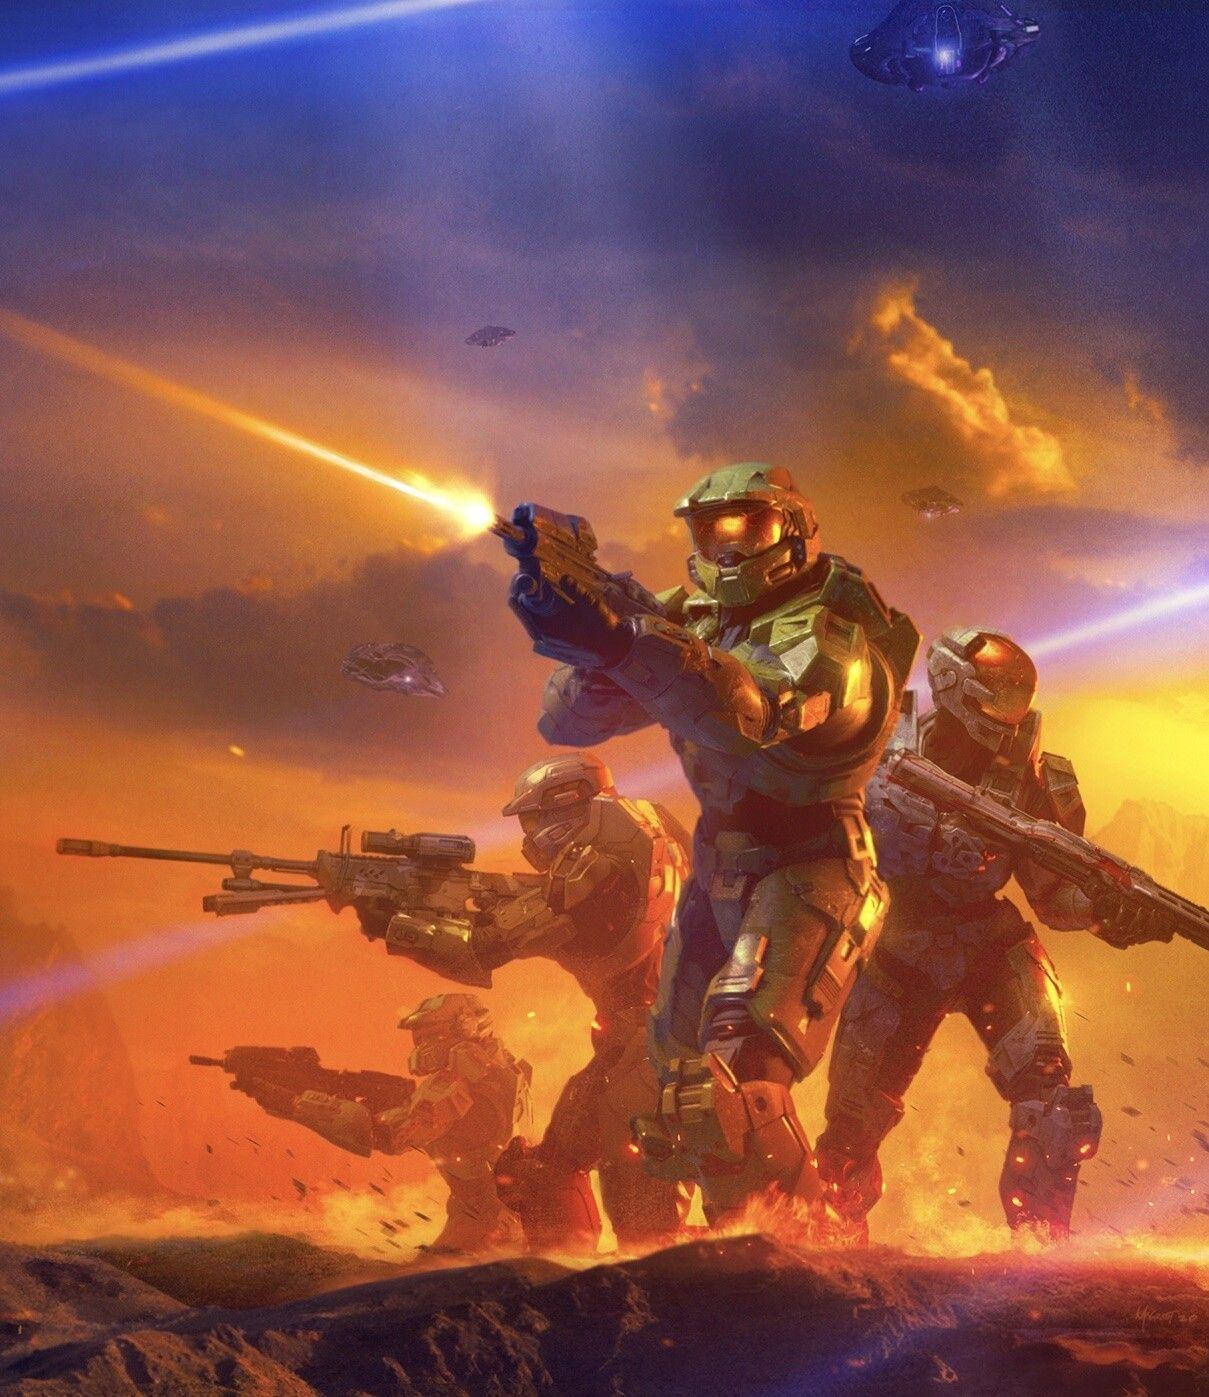 Halo Shadows Of Reach Chris Mcgrath On Artstation At Https Www Artstation Com Artwork 58k38j Halo Master Chief Halo Armor Halo Spartan